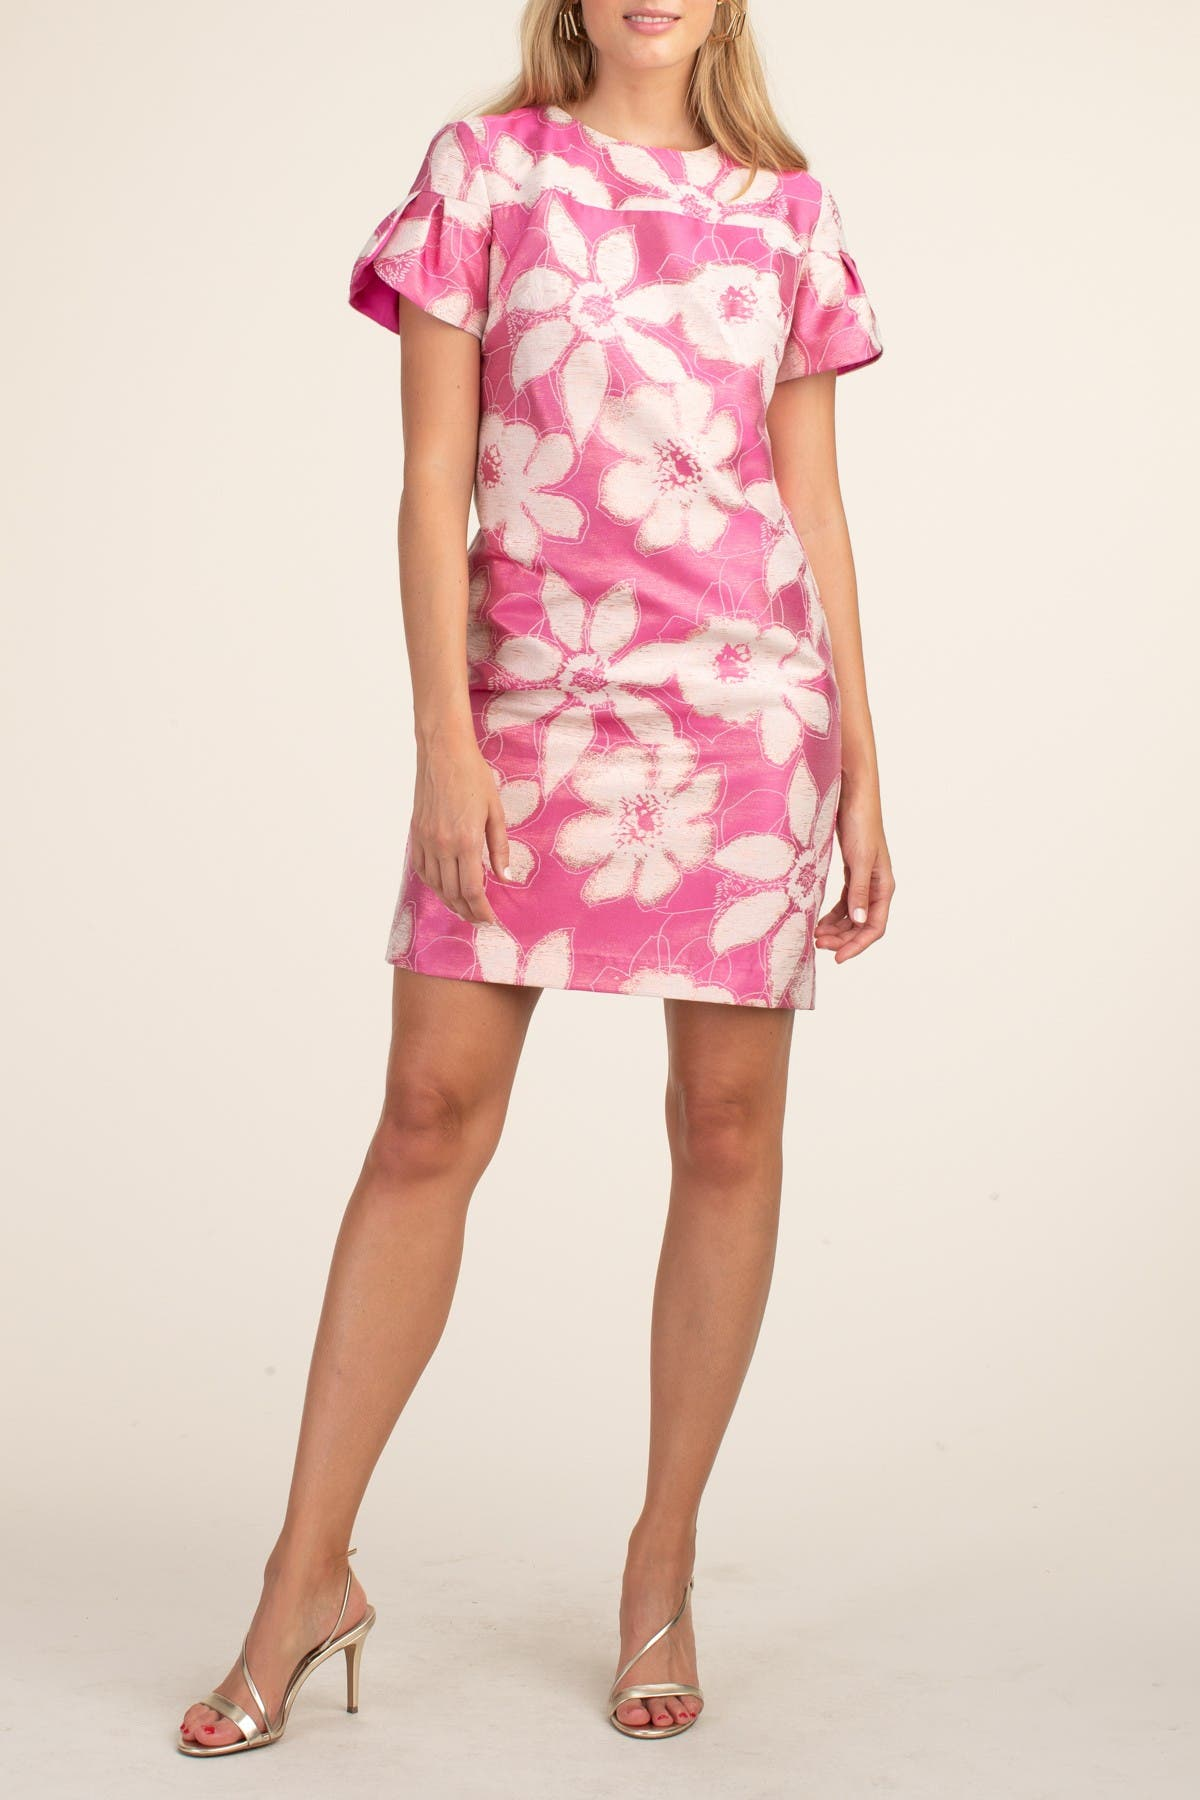 Image of Trina Turk Jacinta Dress